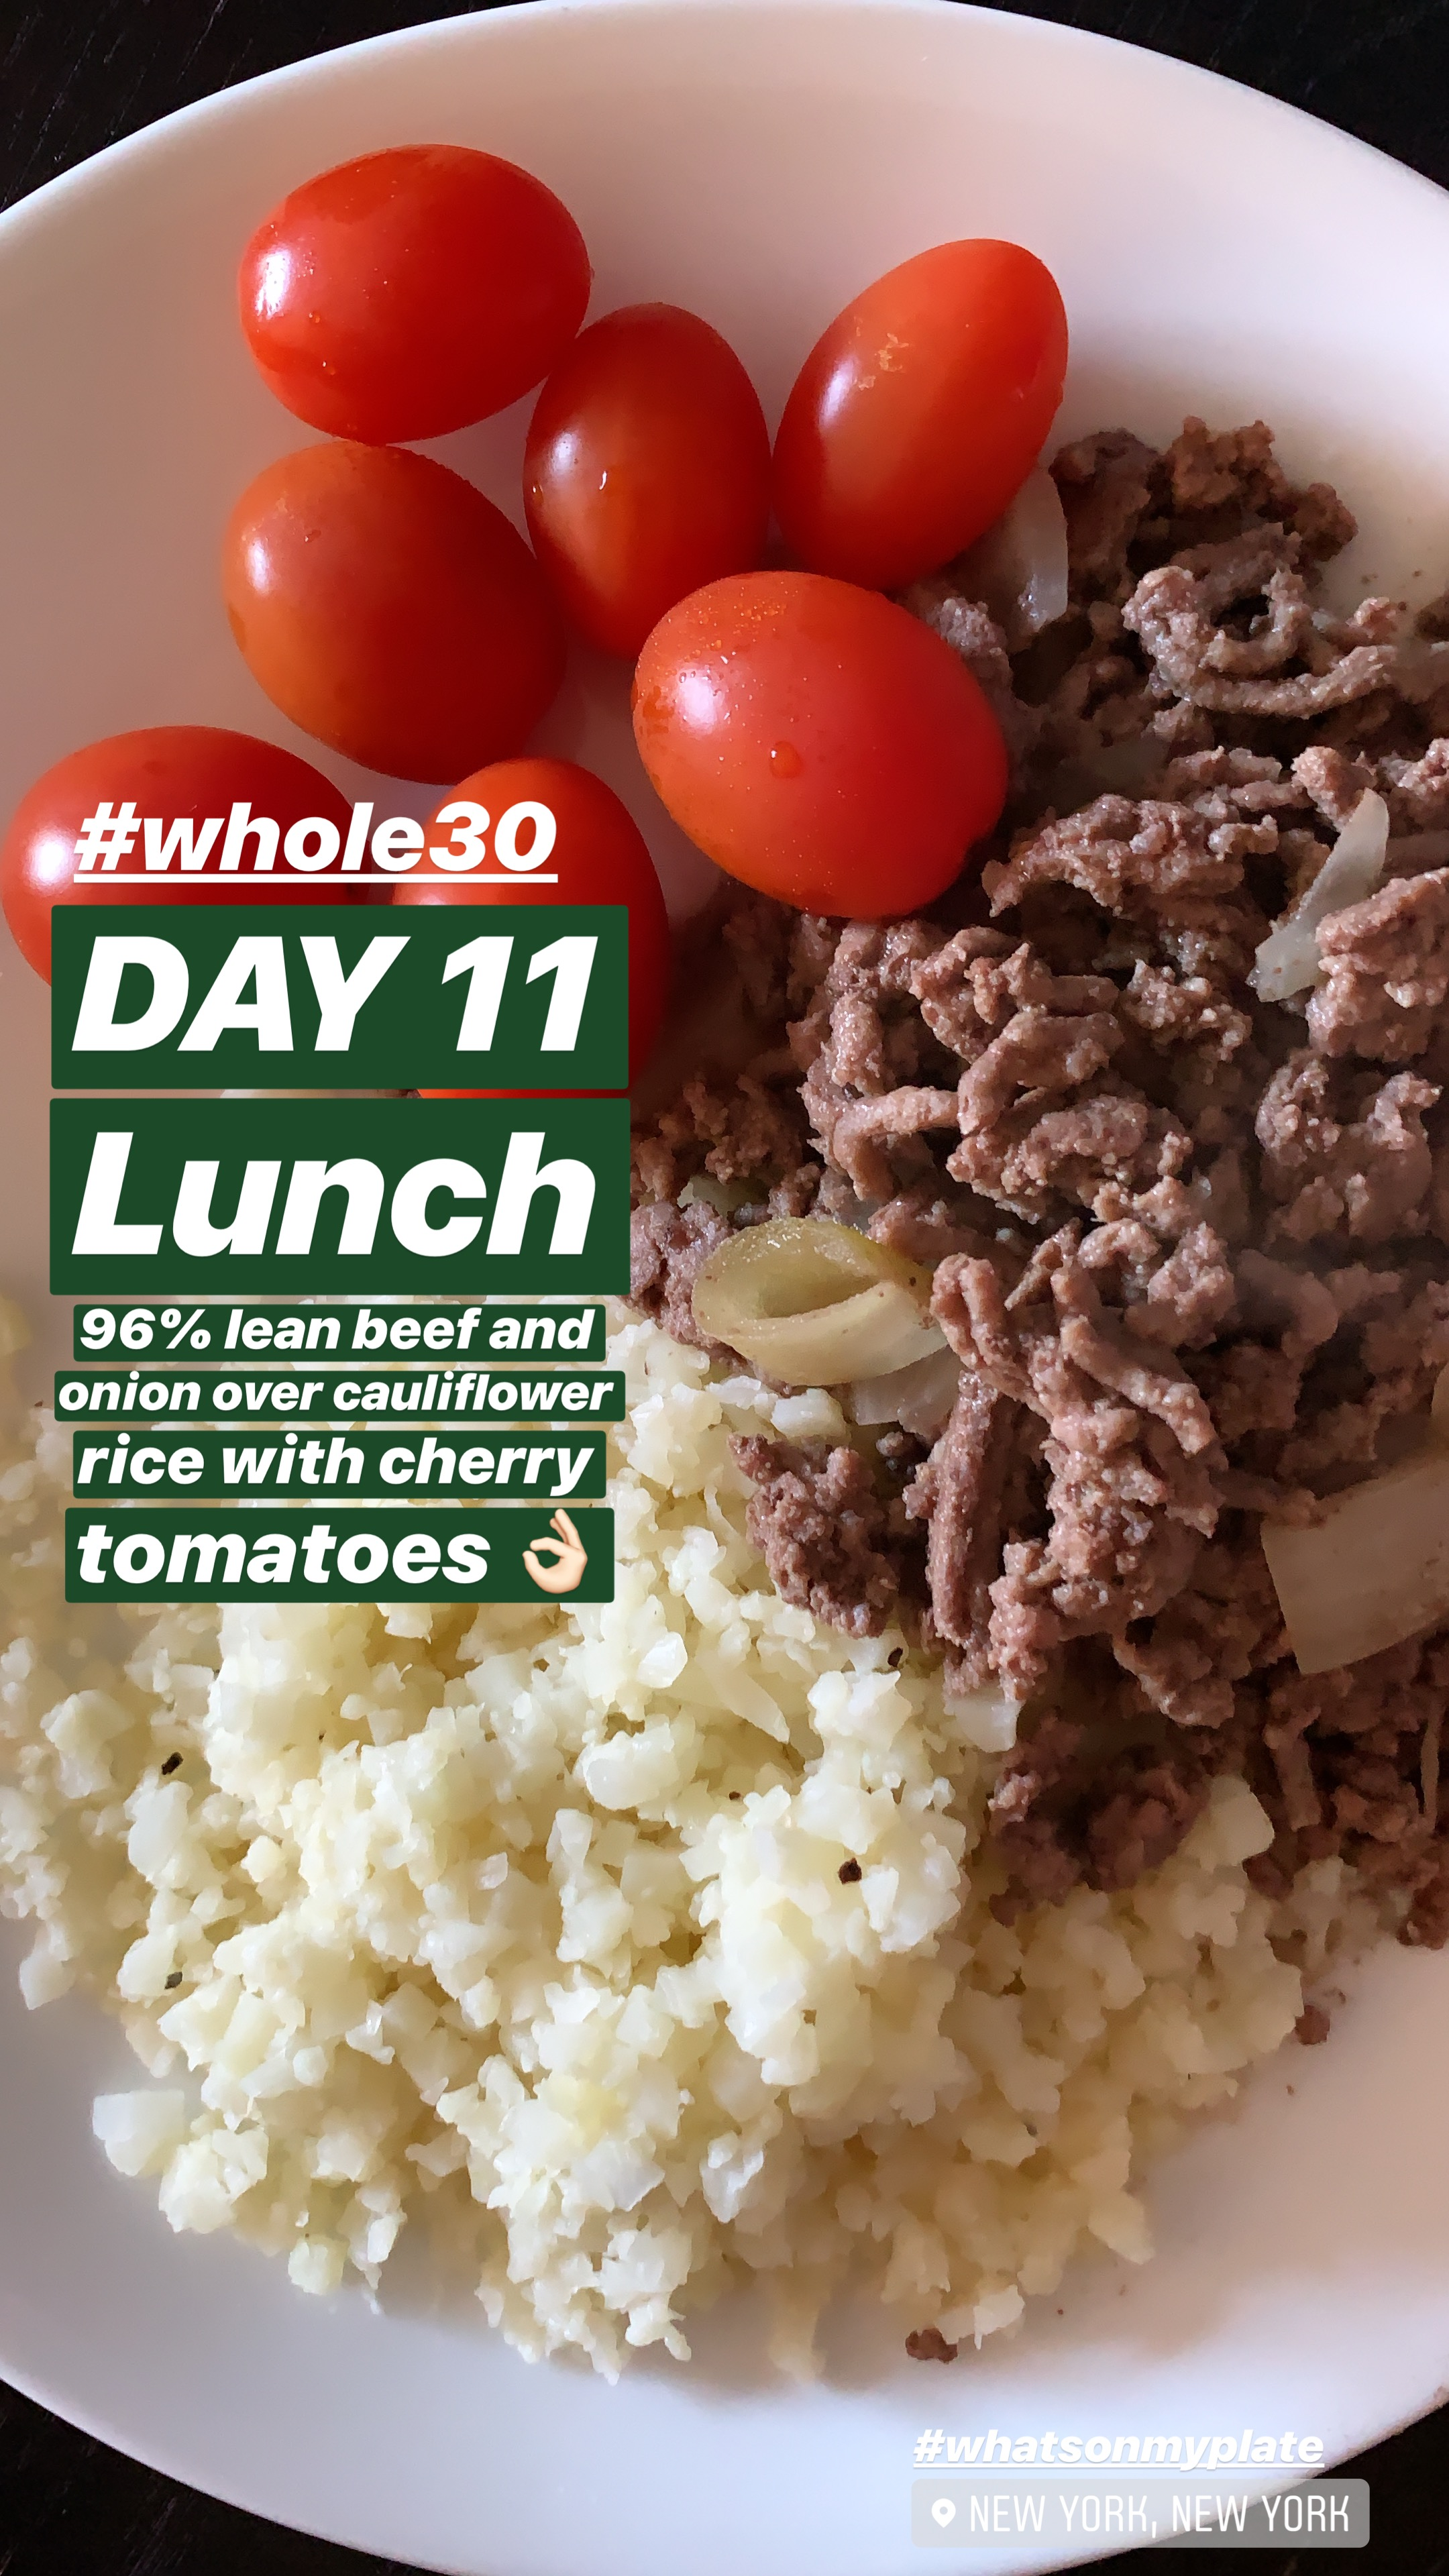 whole30 challenge cynthia chung food lifestyle change0024.JPG